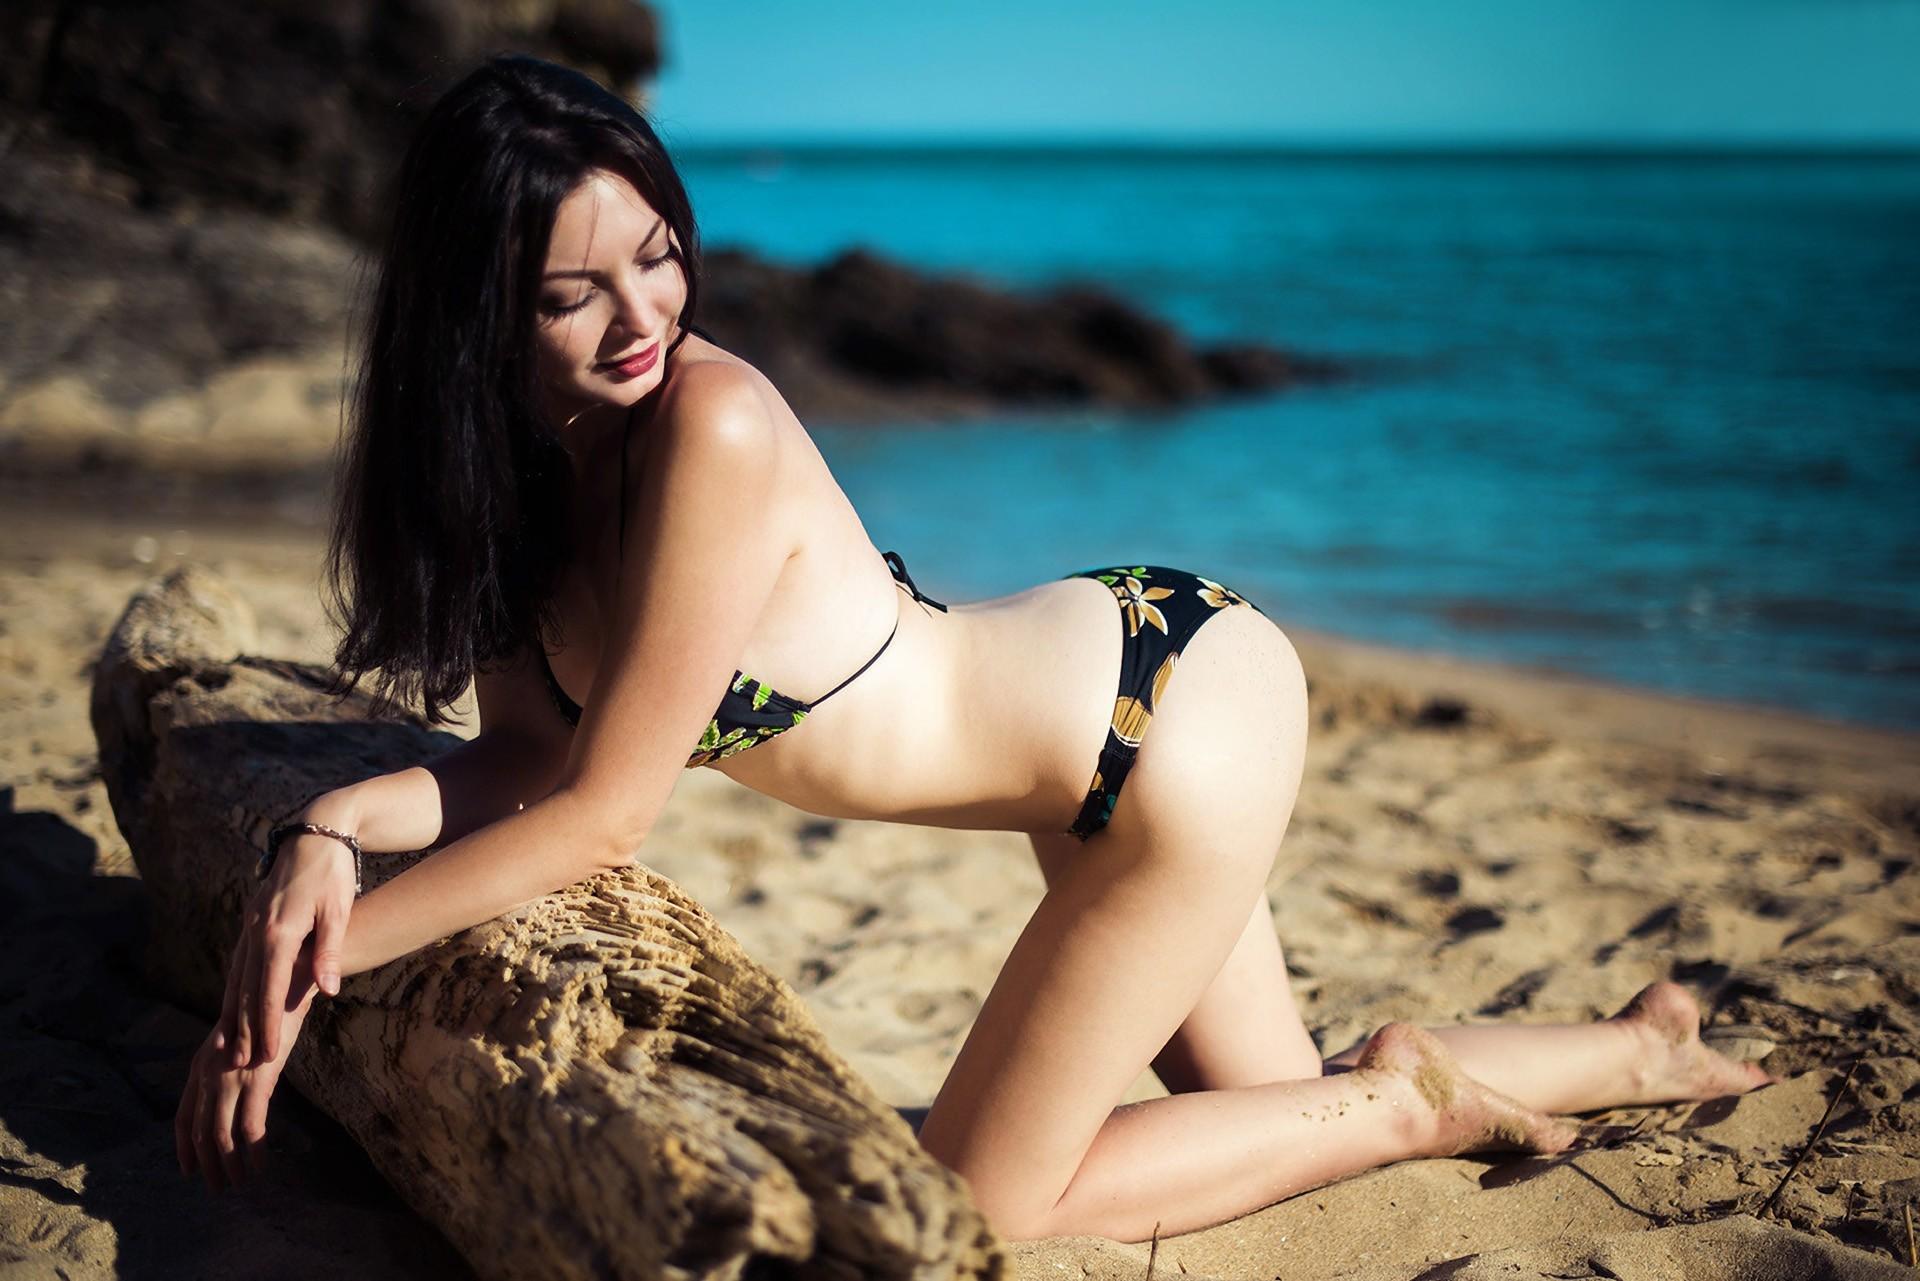 female-ass-photography-amptee-women-nude